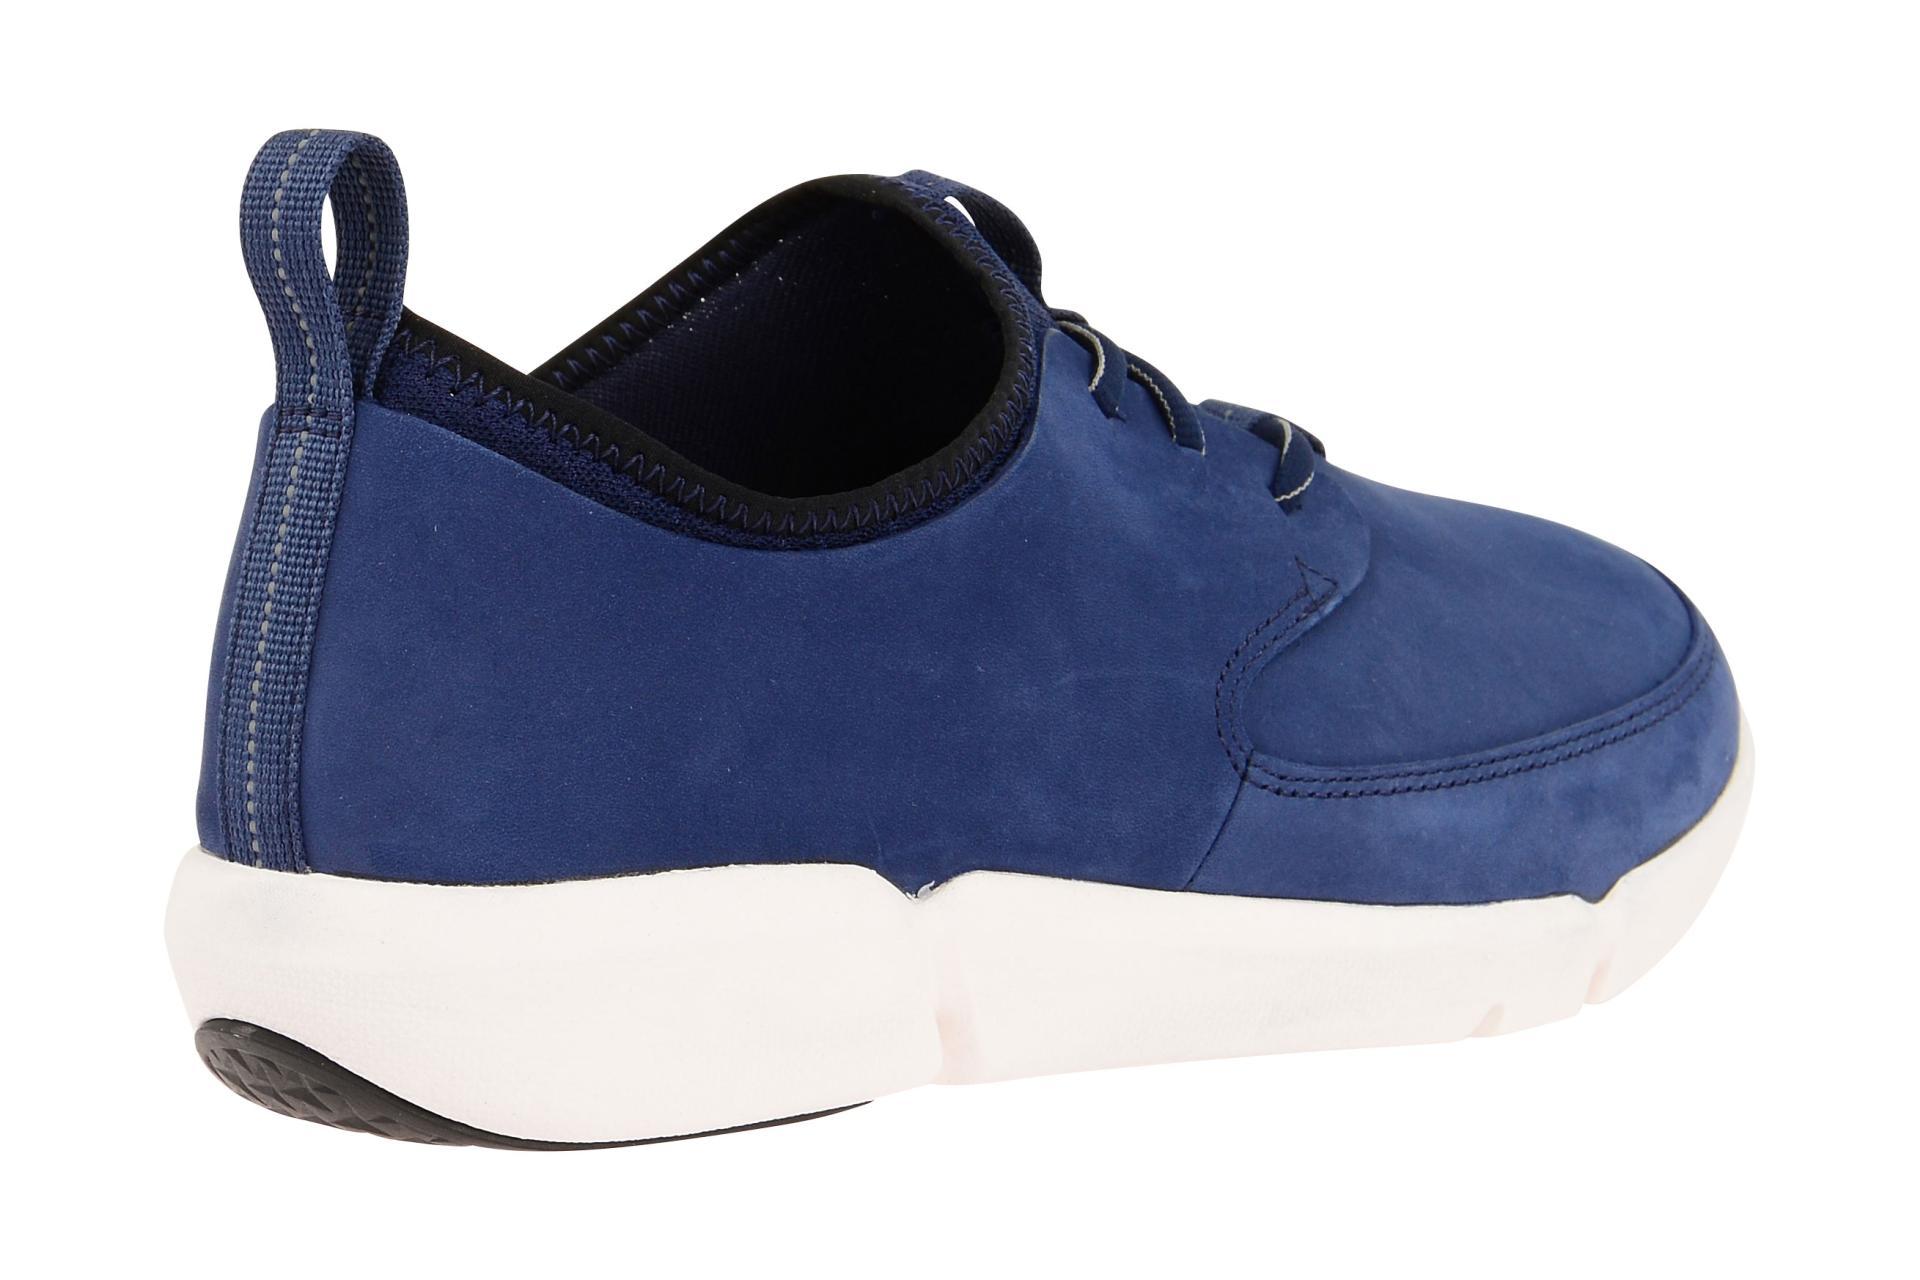 clarks triflow schuhe blau herren sneaker schuhhaus. Black Bedroom Furniture Sets. Home Design Ideas